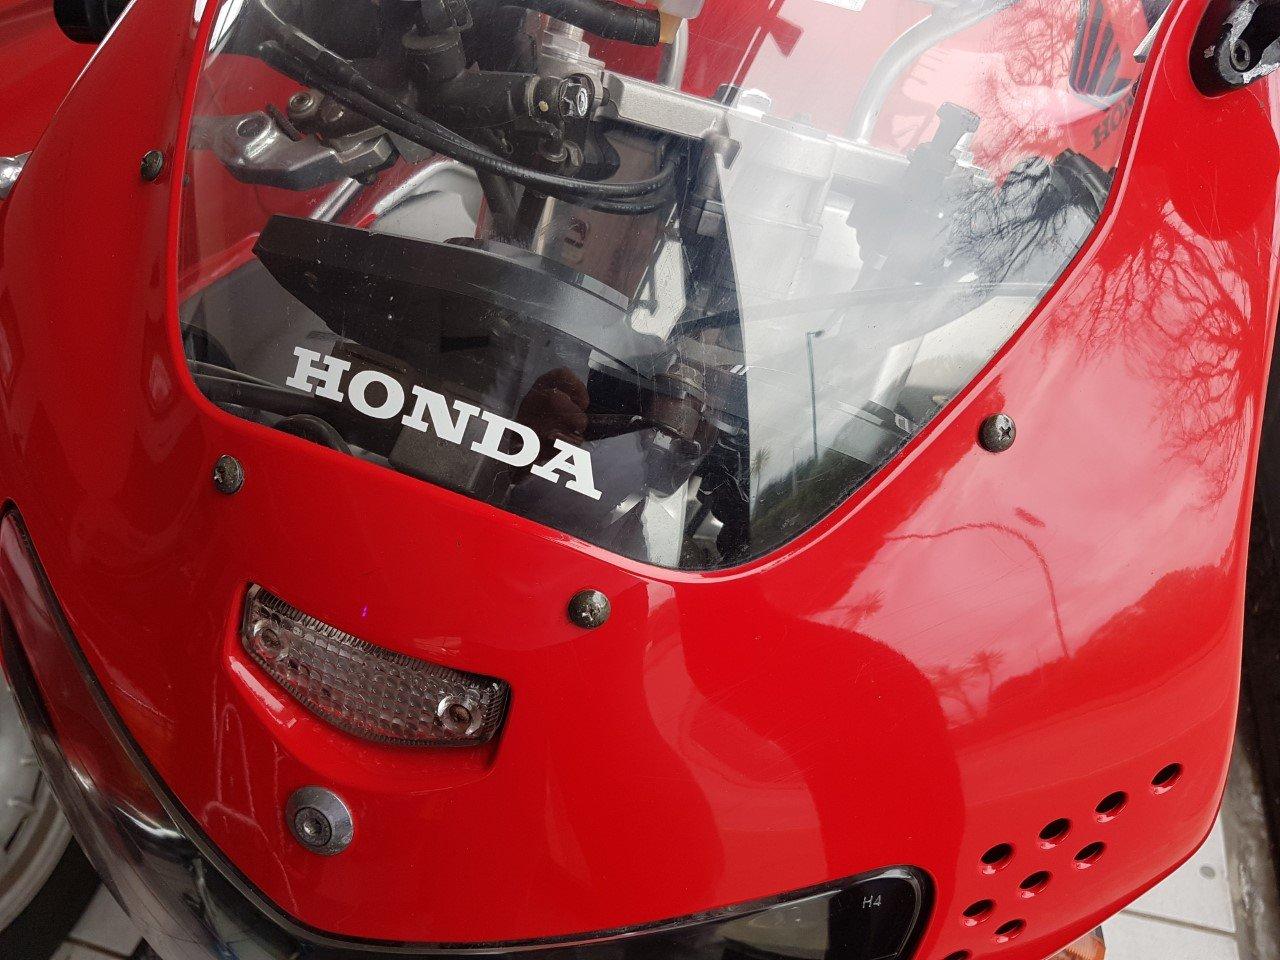 1999 Honda CBR 900 RR Fireblade 13k Miles 1 Owner For Sale (picture 2 of 6)